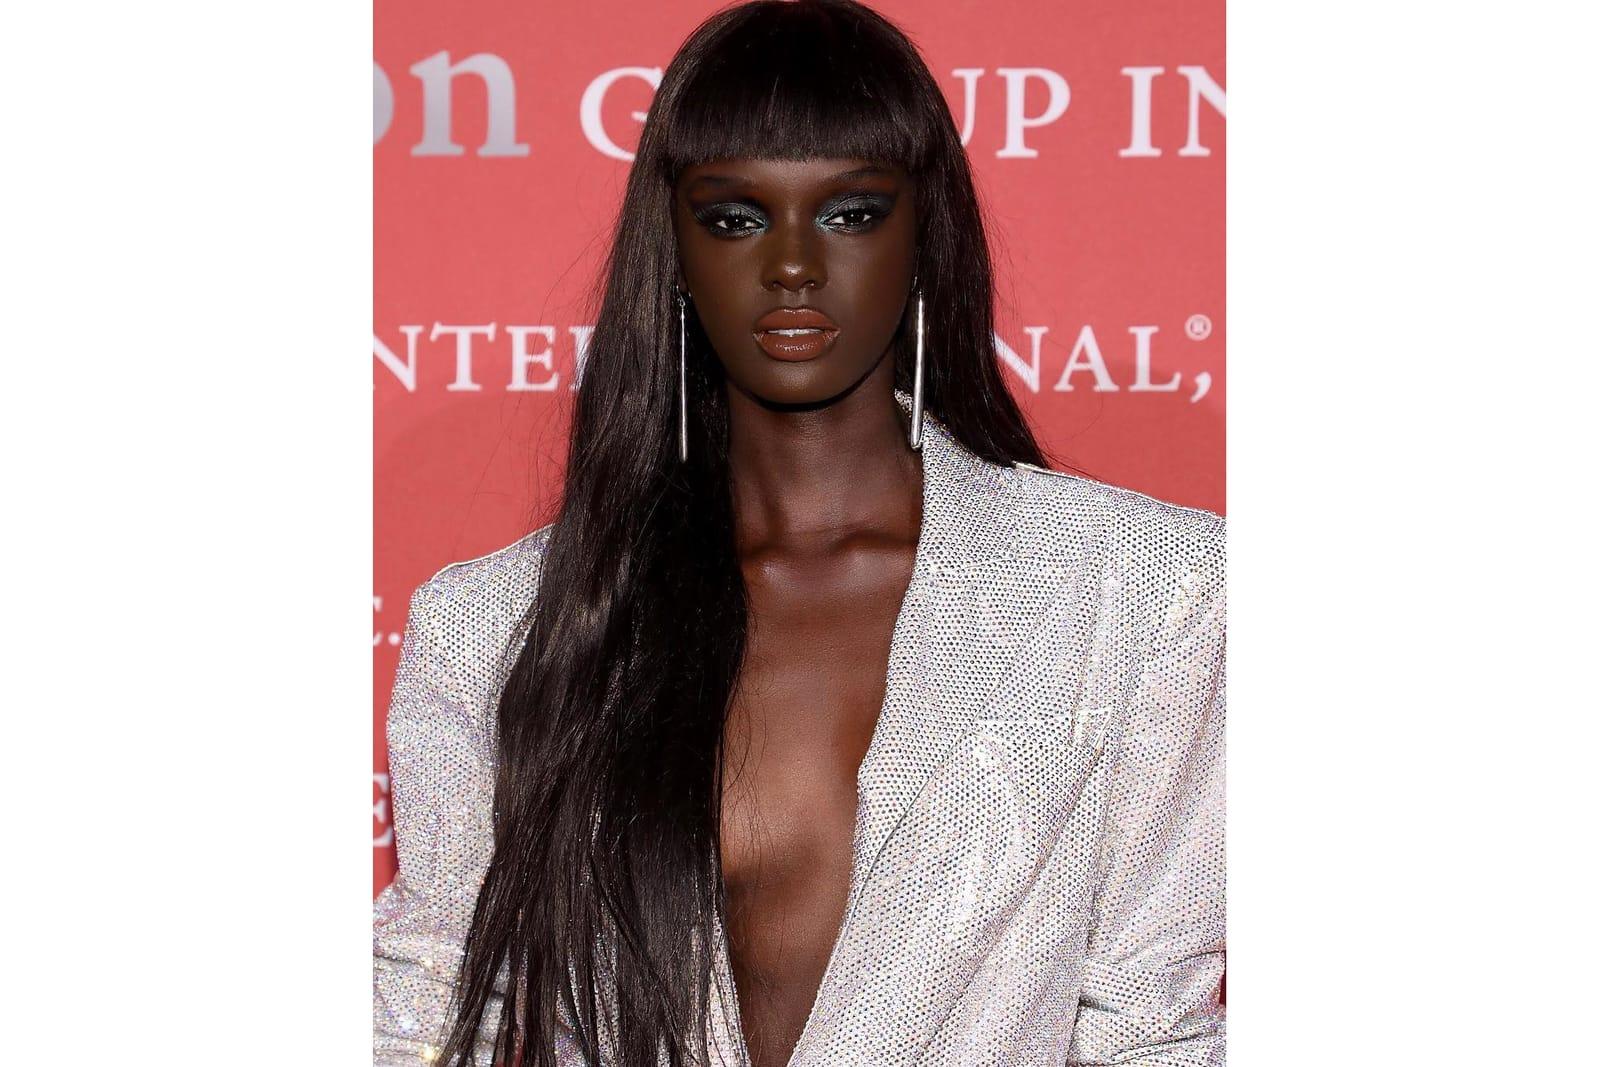 8 Celebrity Hairstyle Looks to Try This Season Haircut Fall Winter Style Hailey Baldwin Hair Lana Condor Duckie Thot Billie Eilish Lucy Hale Amandla Stenberg